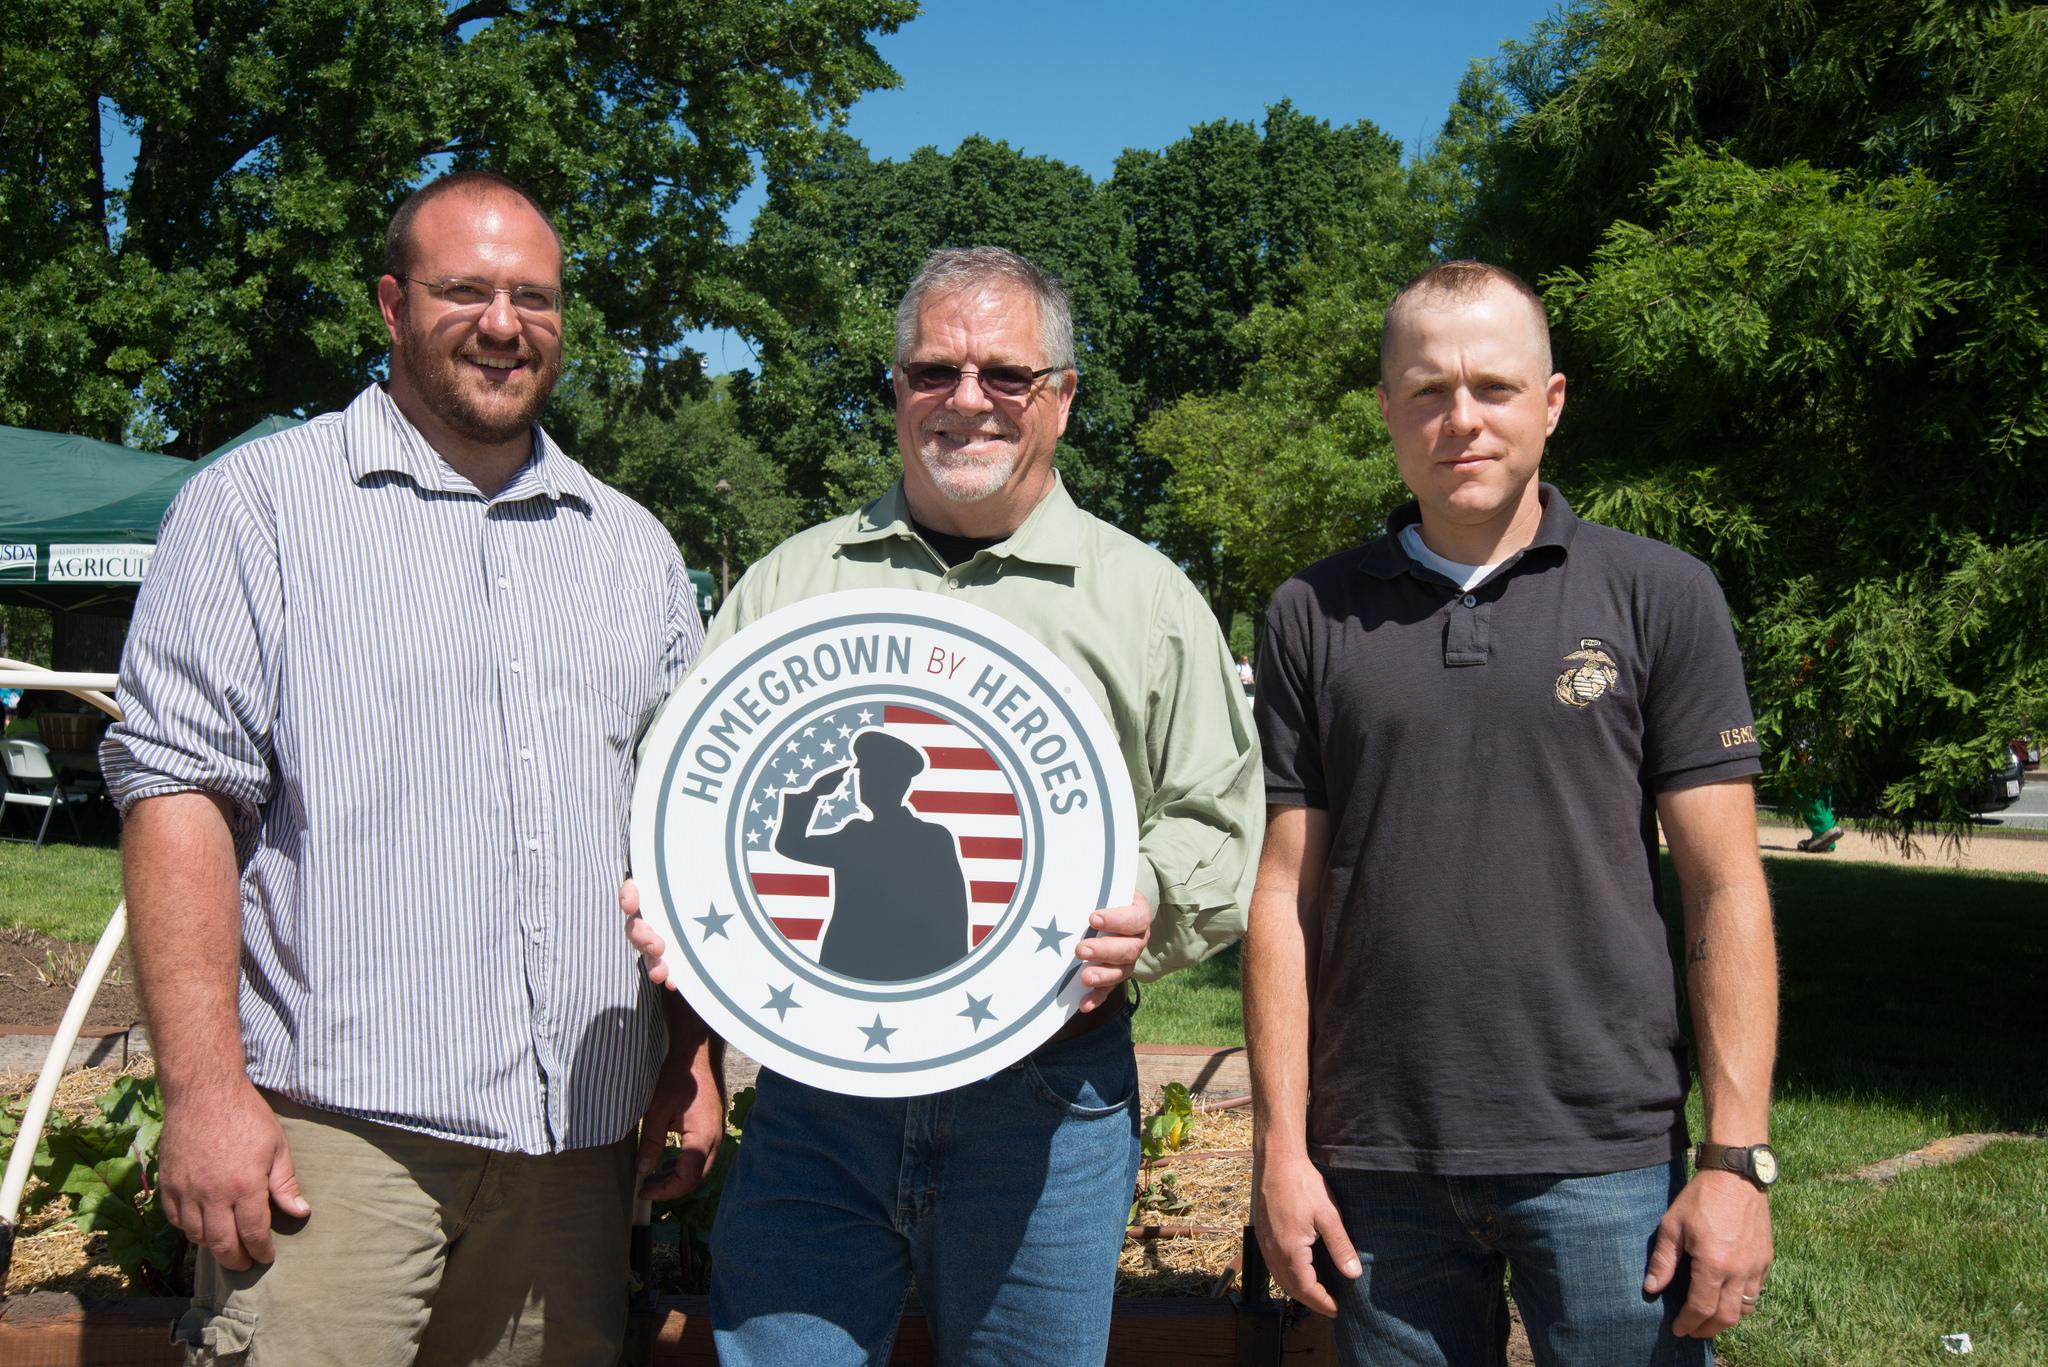 Returning Iowa Veterans: Getting Armed to Farm